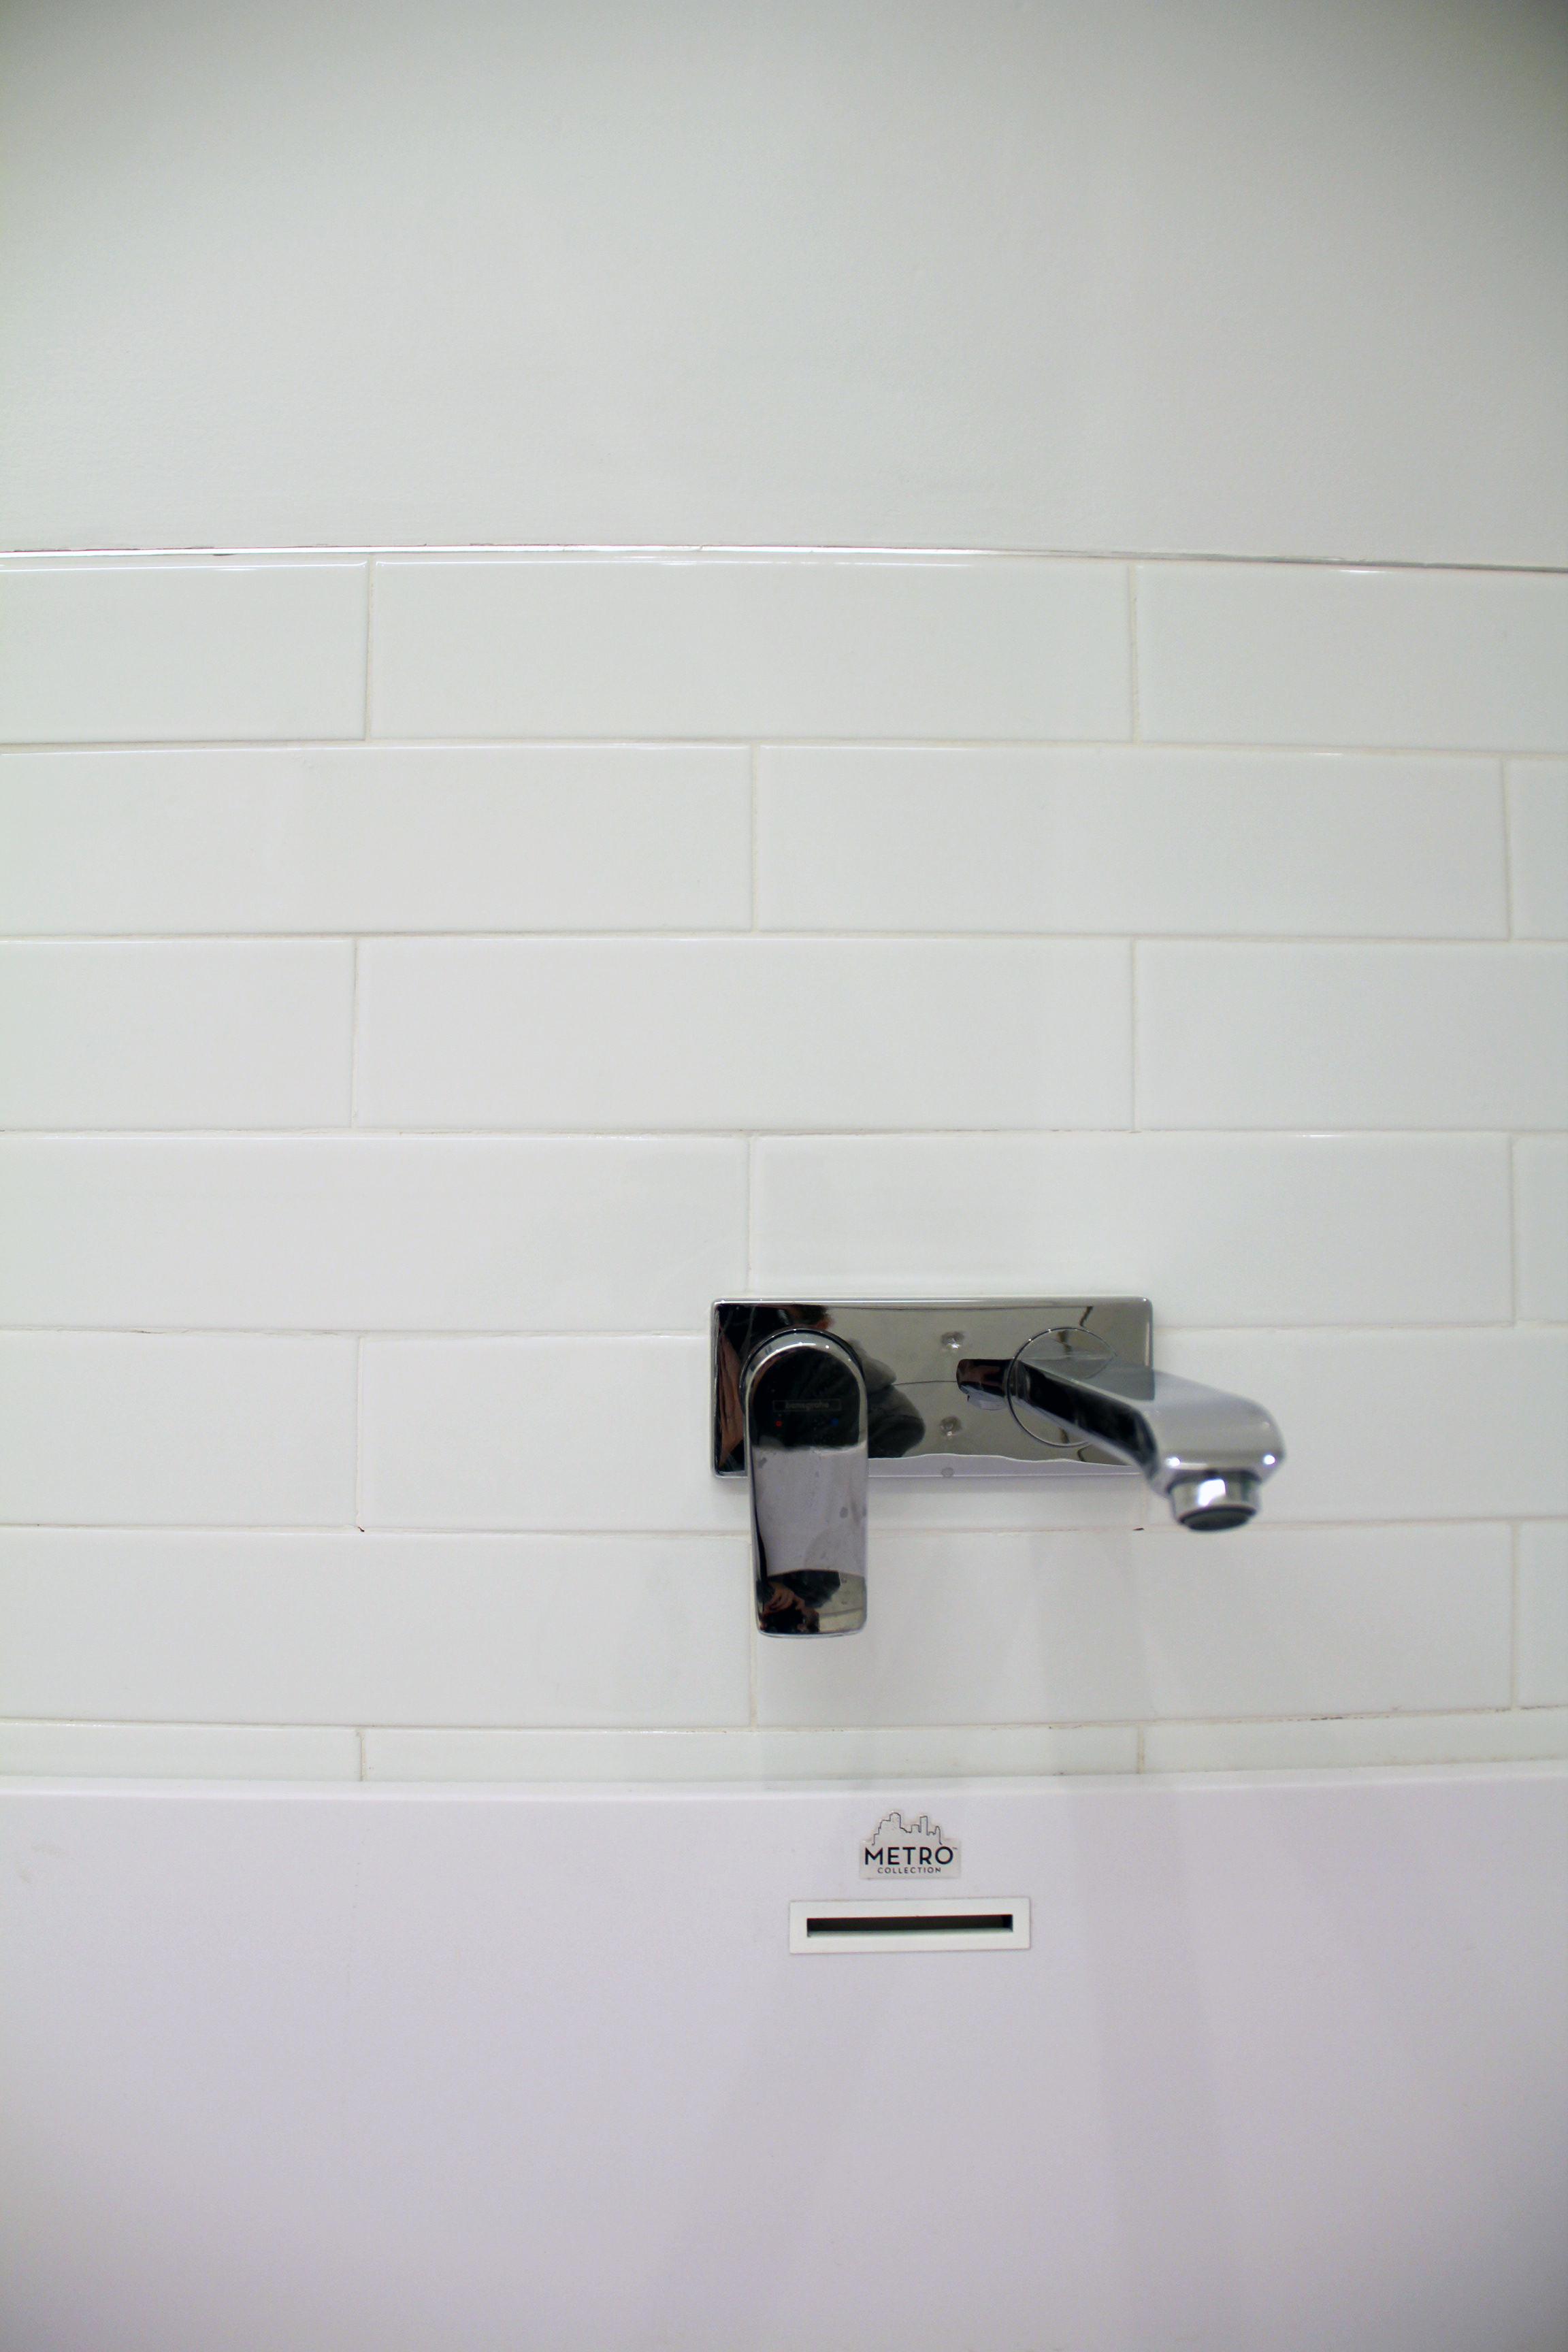 tub faucet.jpg